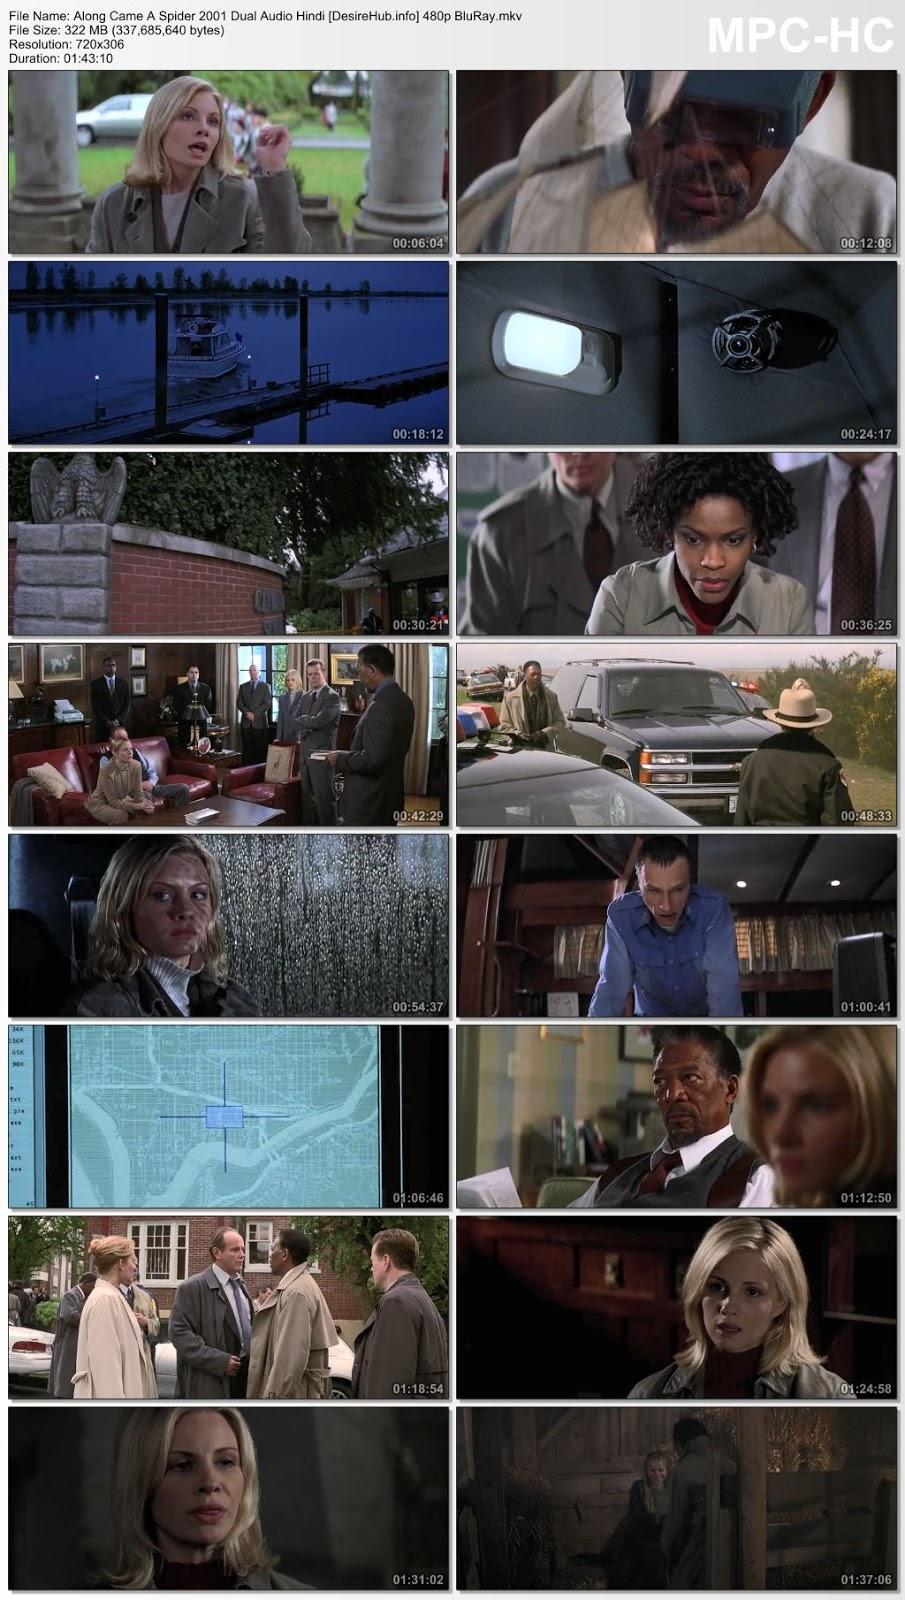 Along Came A Spider 2001 Dual Audio Hindi 720p BluRay 850MB Desirehub